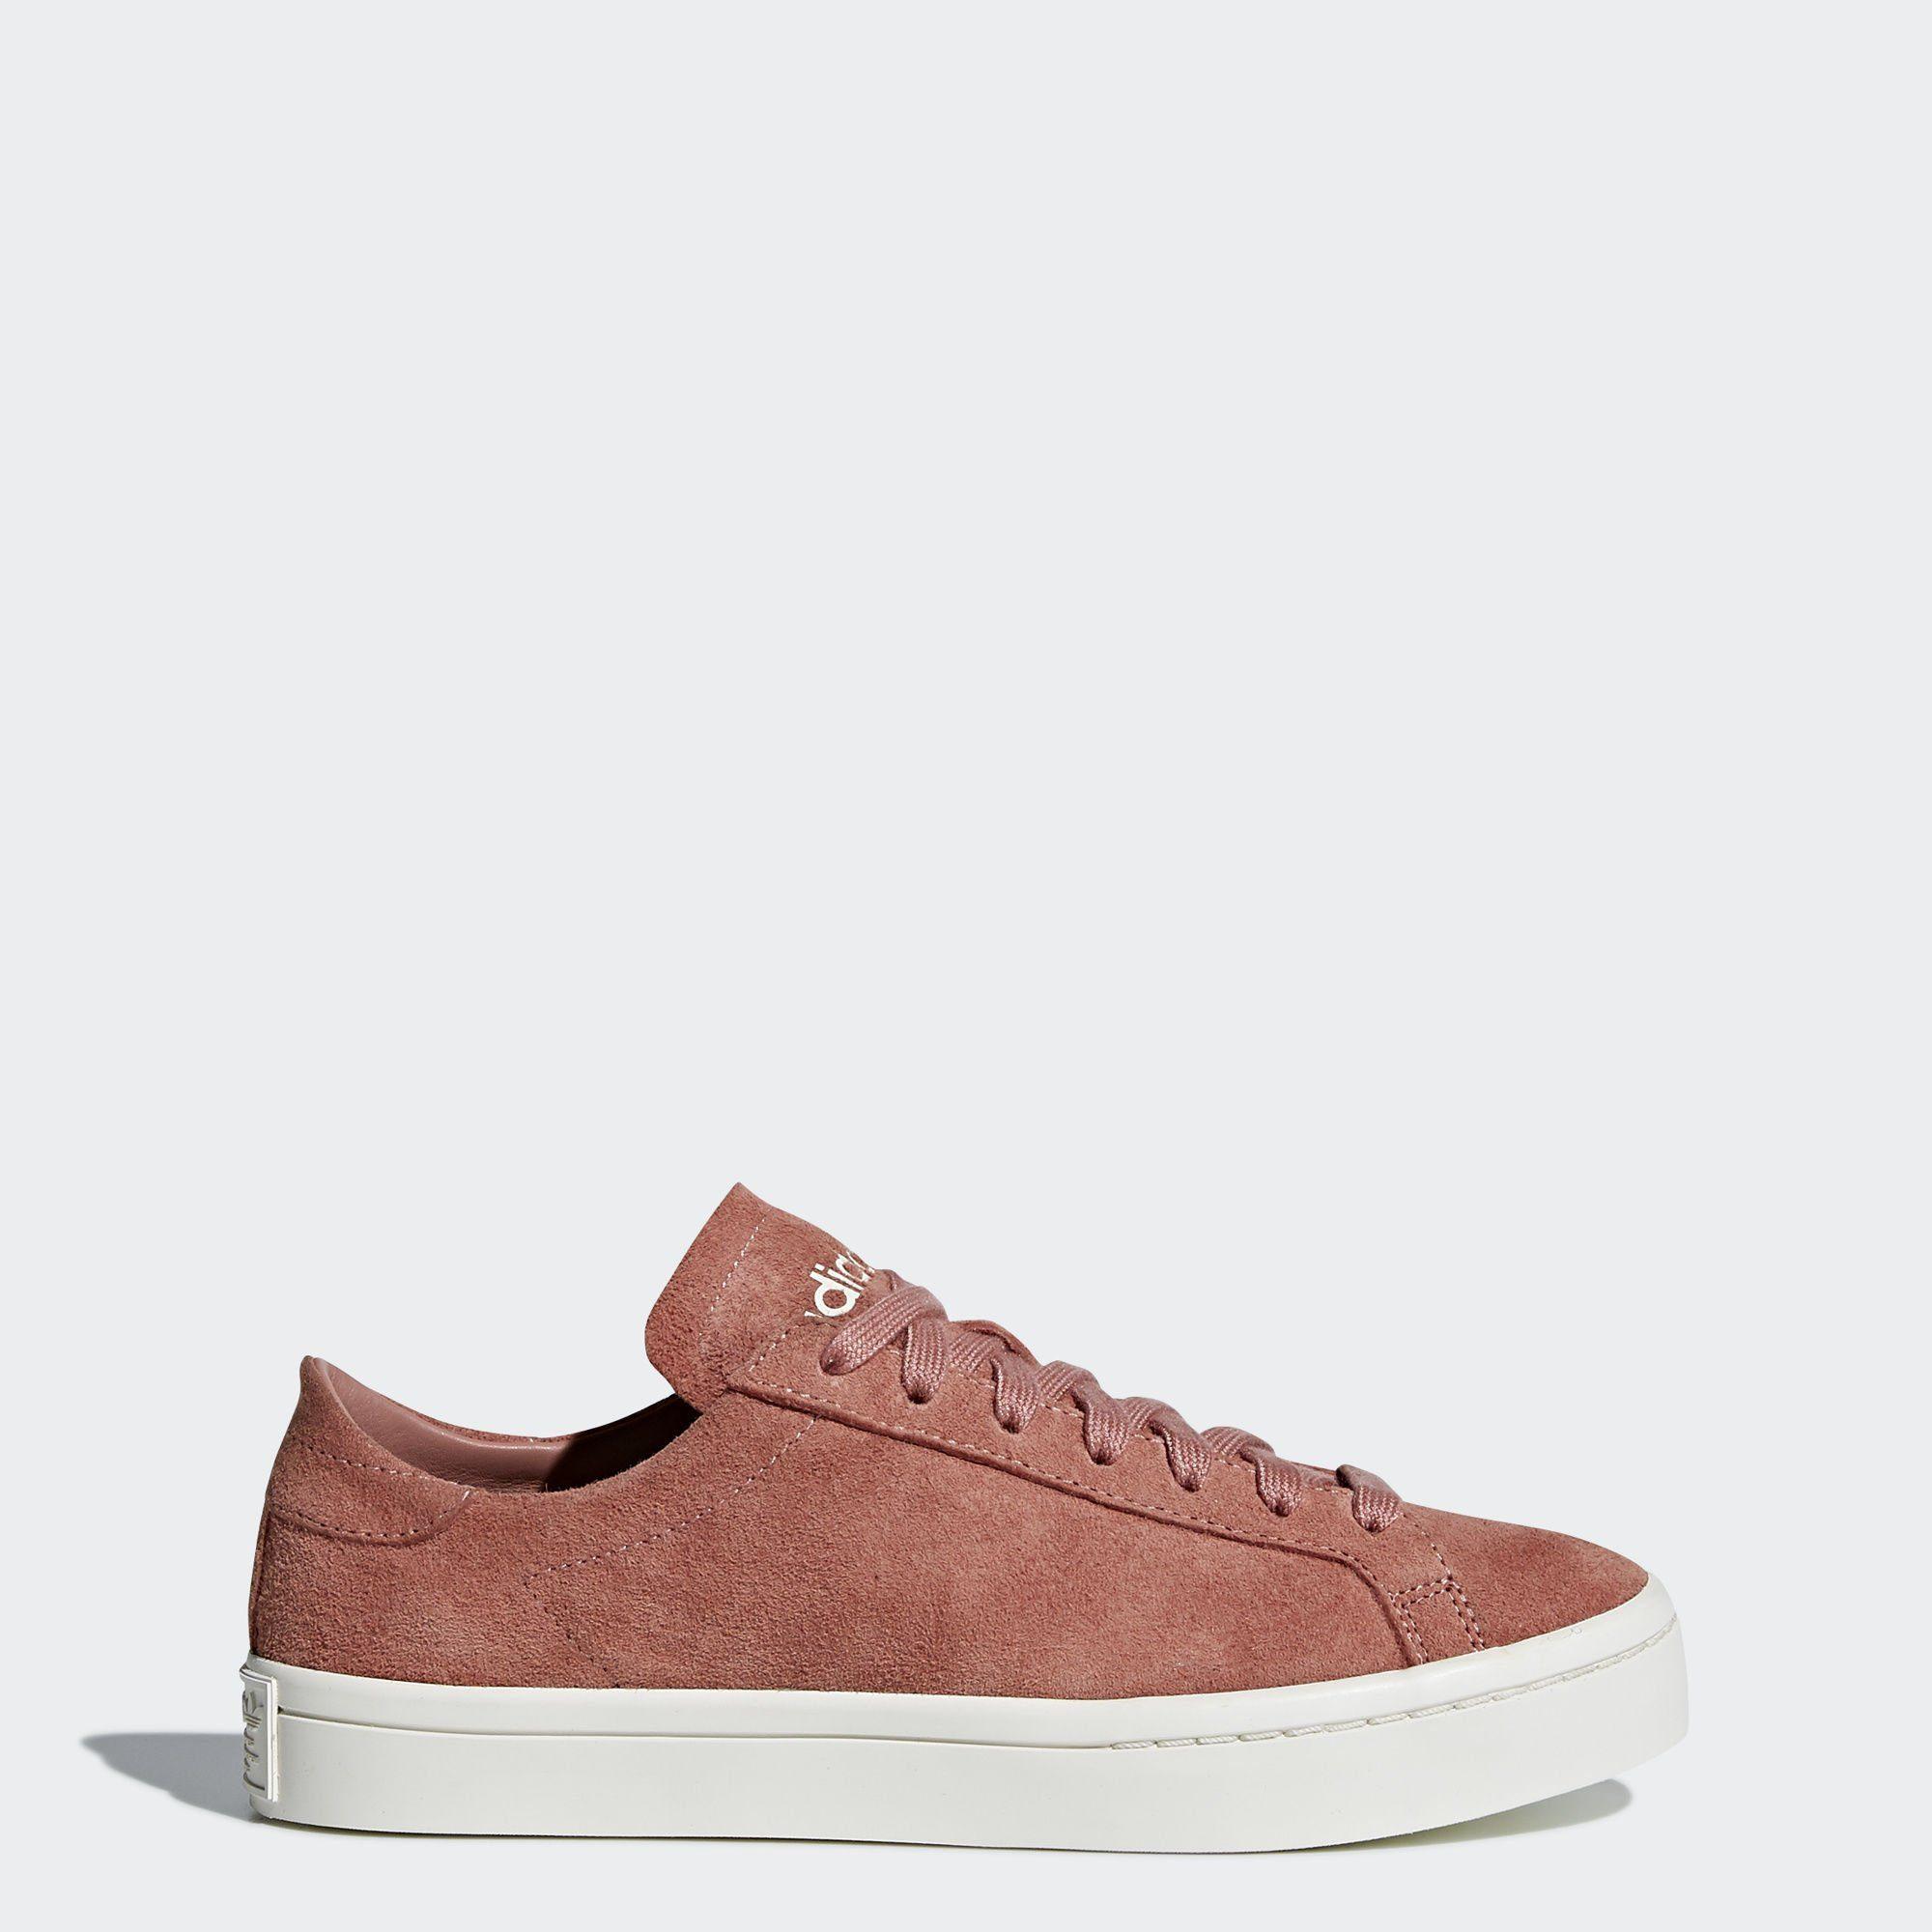 adidas Originals Court Vantage Schuh Sneaker  ash